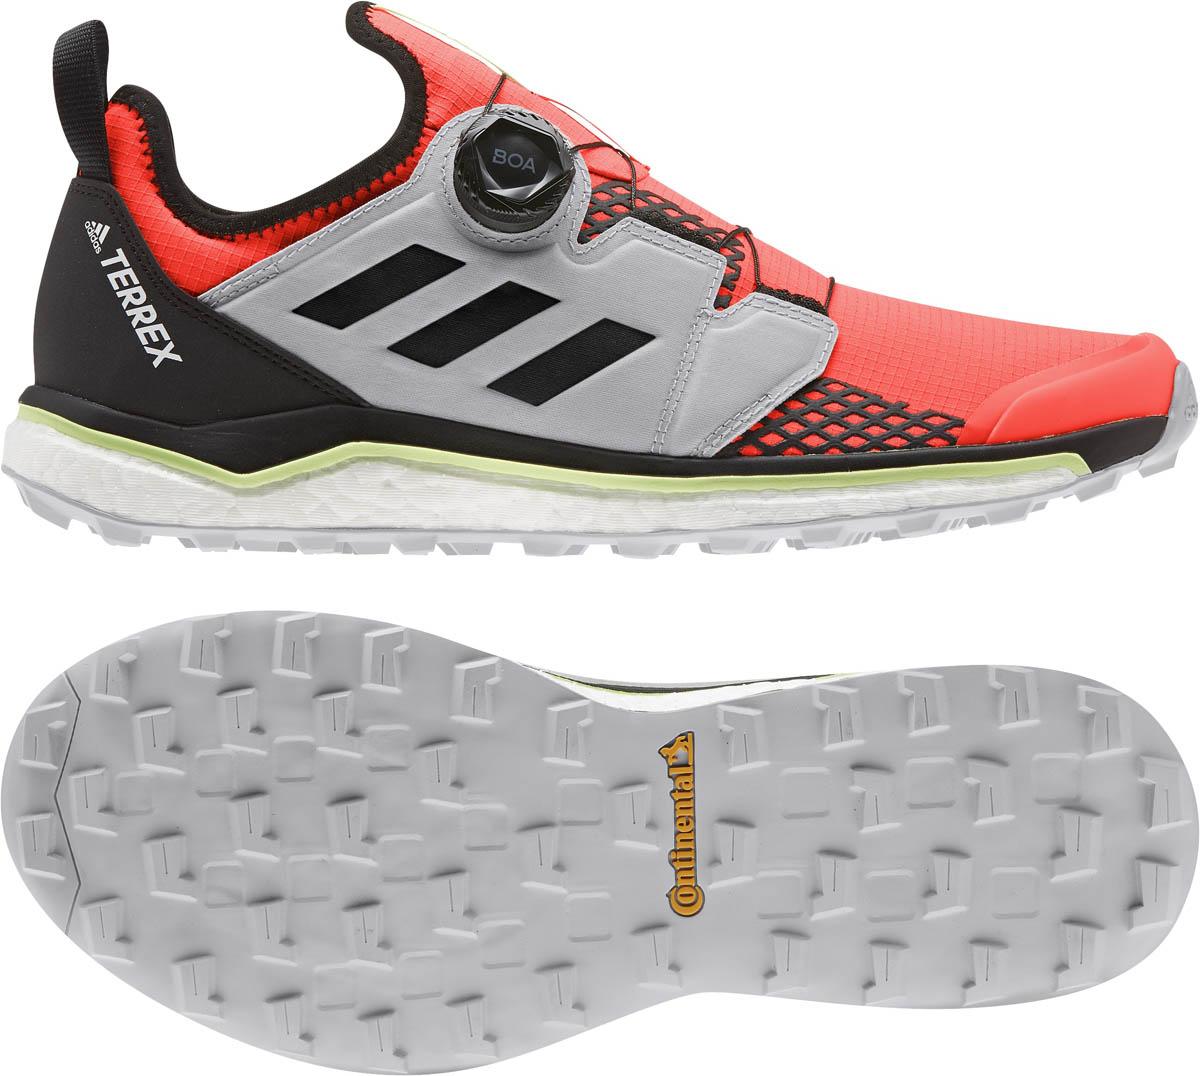 Boa® bientôt sur vos Adidas, Asics, New Balance ou Saucony ?